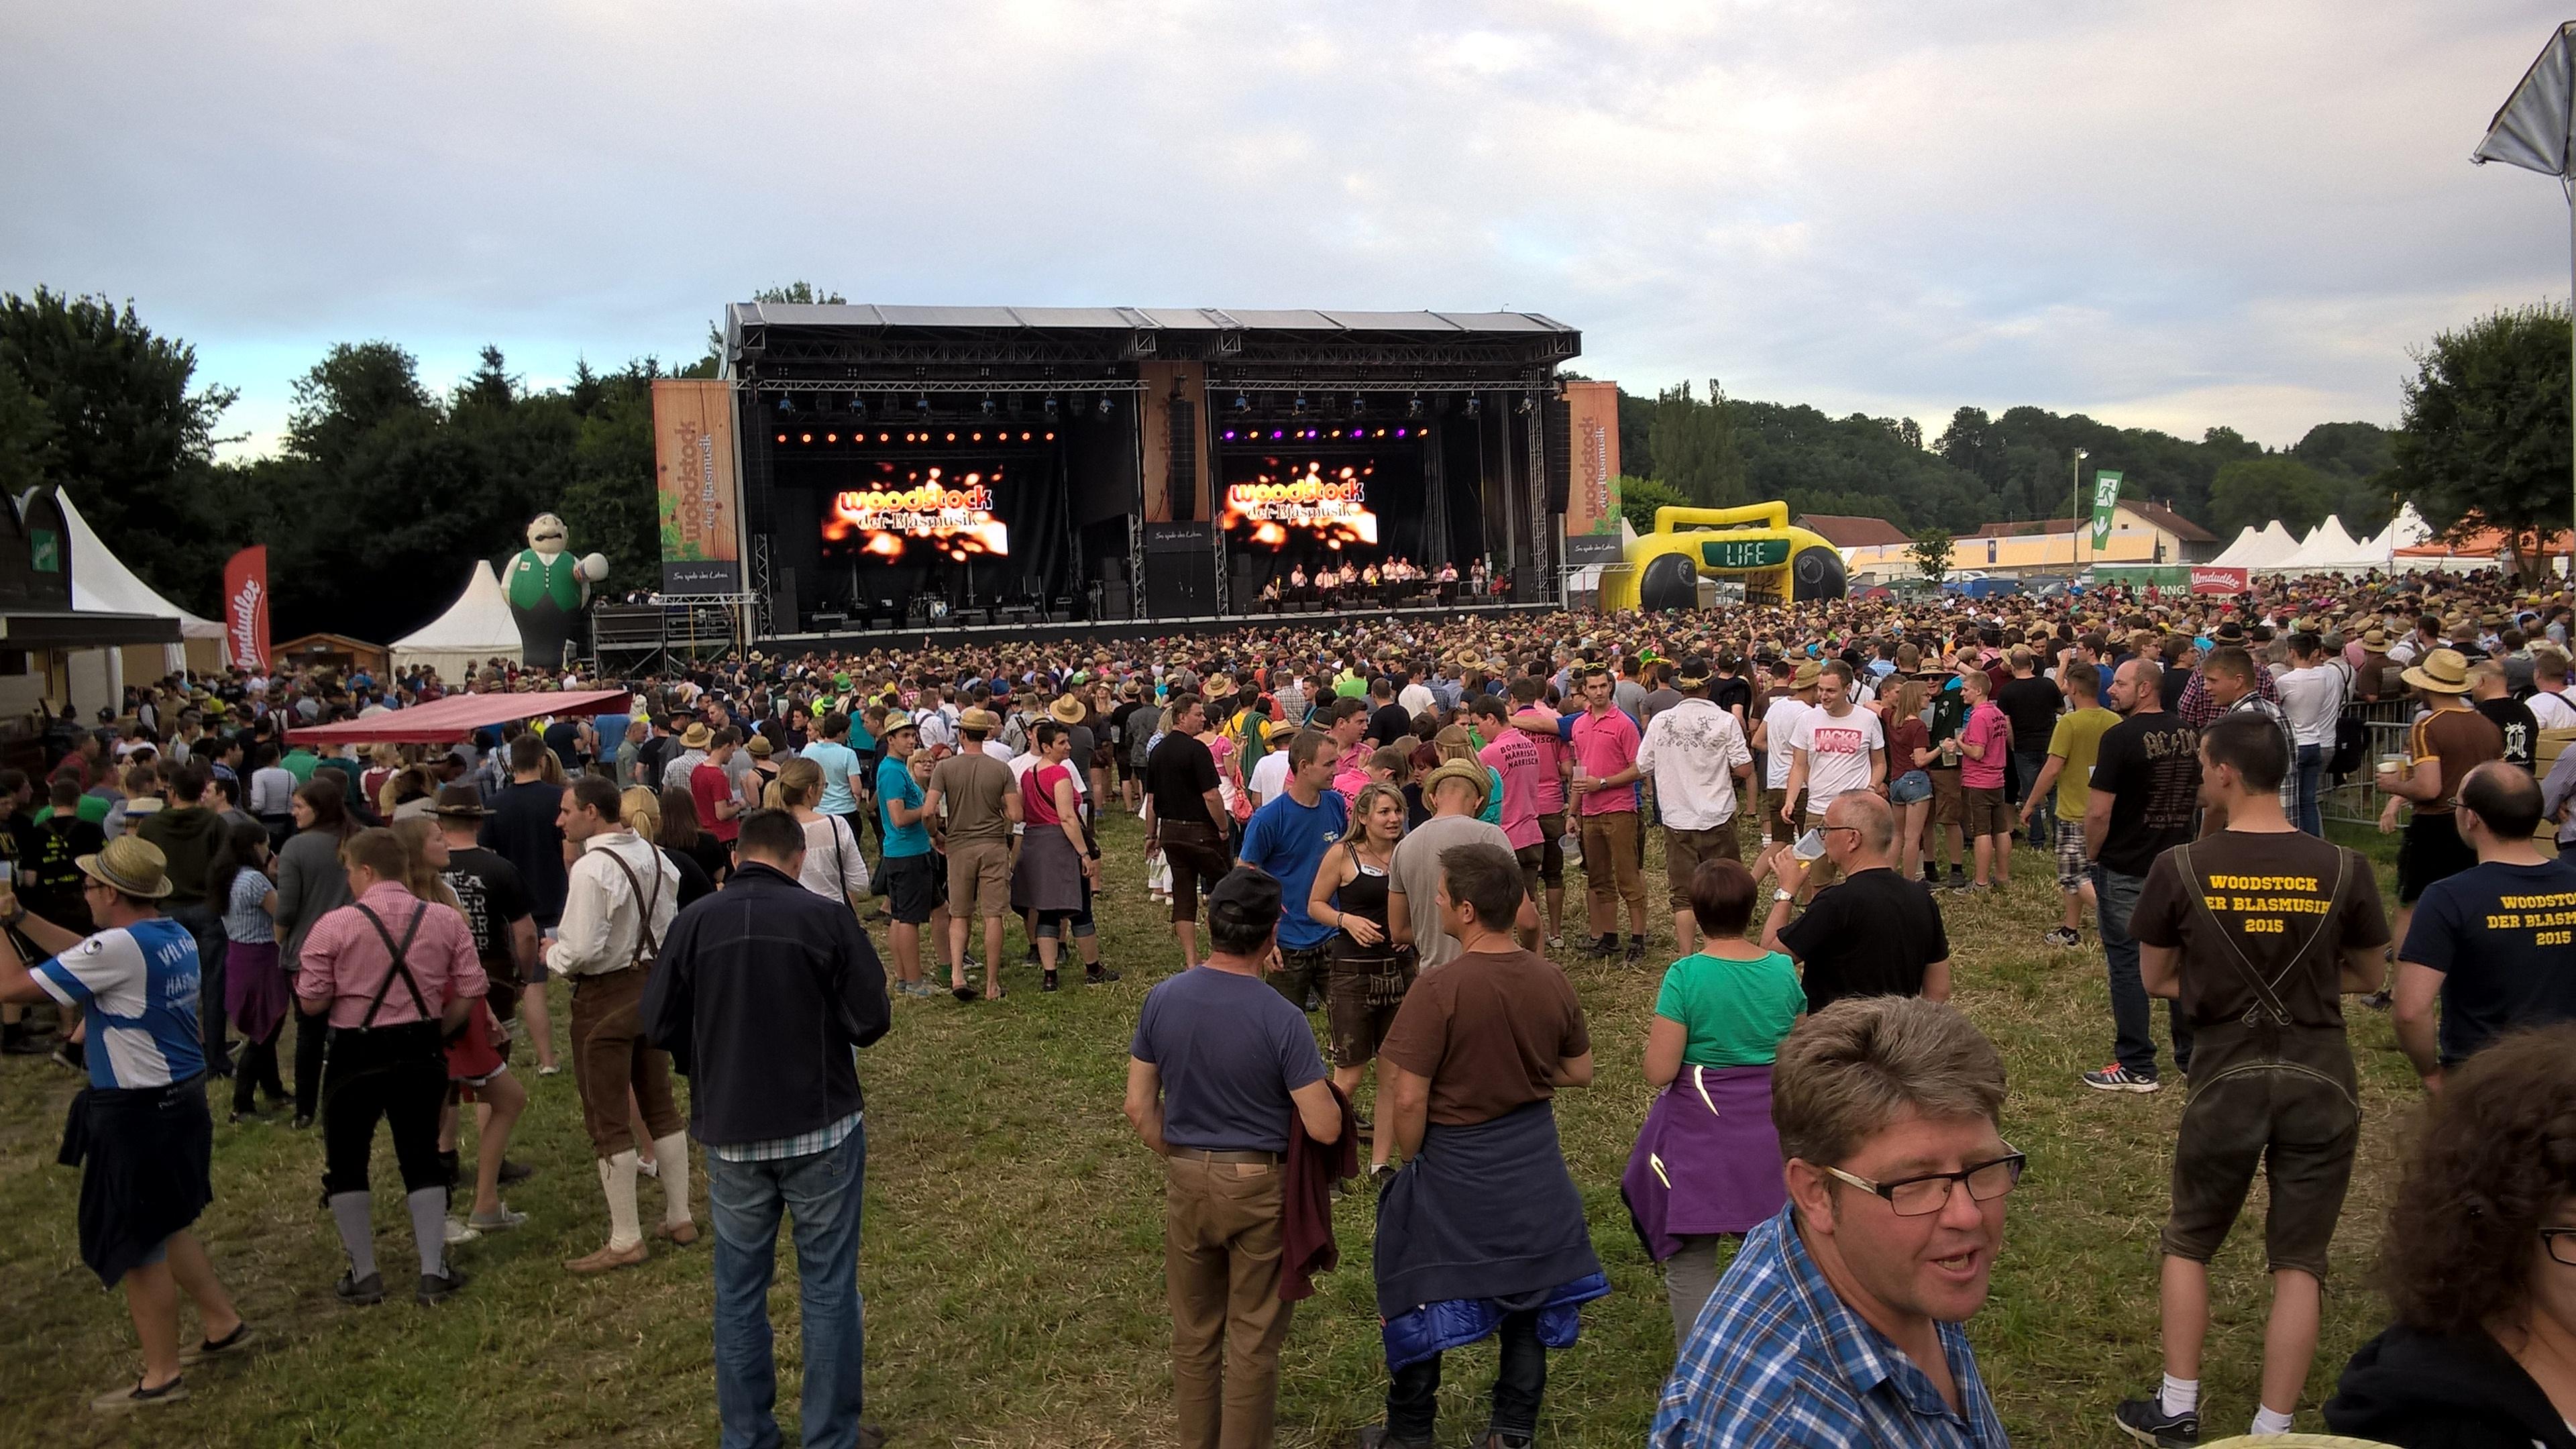 Woodstock Der Blasmusik Wikipedia